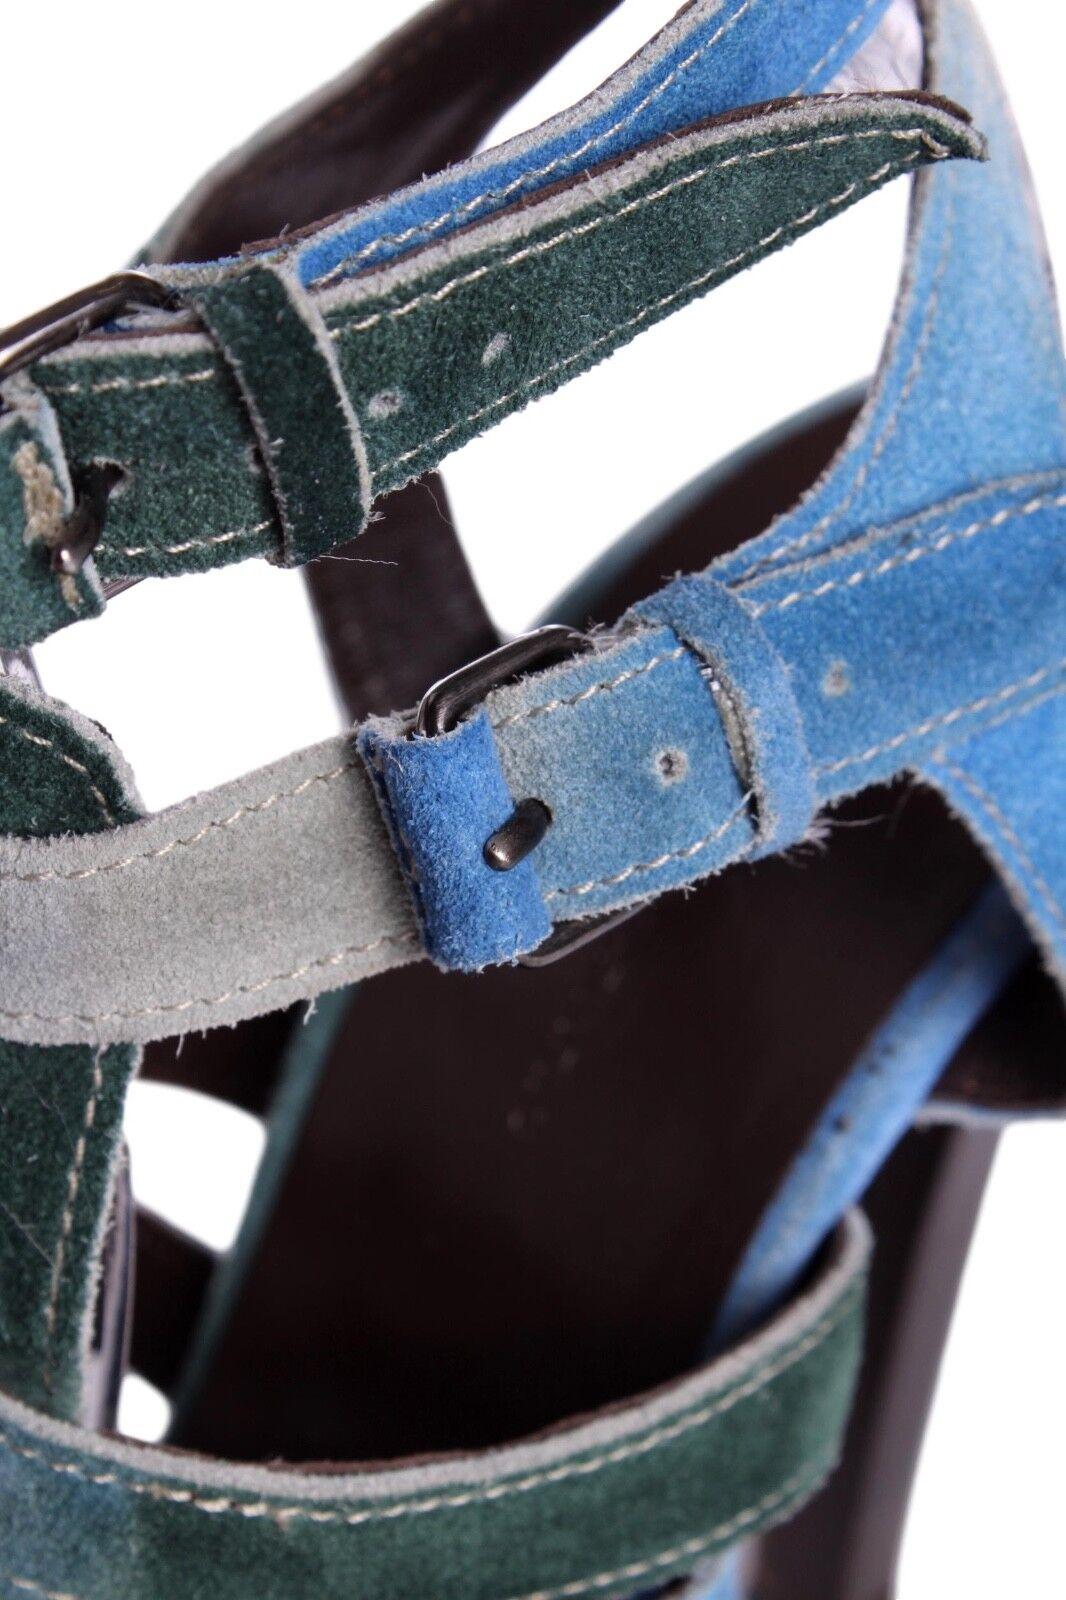 Balenciaga azul & verde Gamuza de Tie-Dye jaula multistrap Hebilla Sandalia bombas de Gamuza EE. UU. 8.5 109ecc